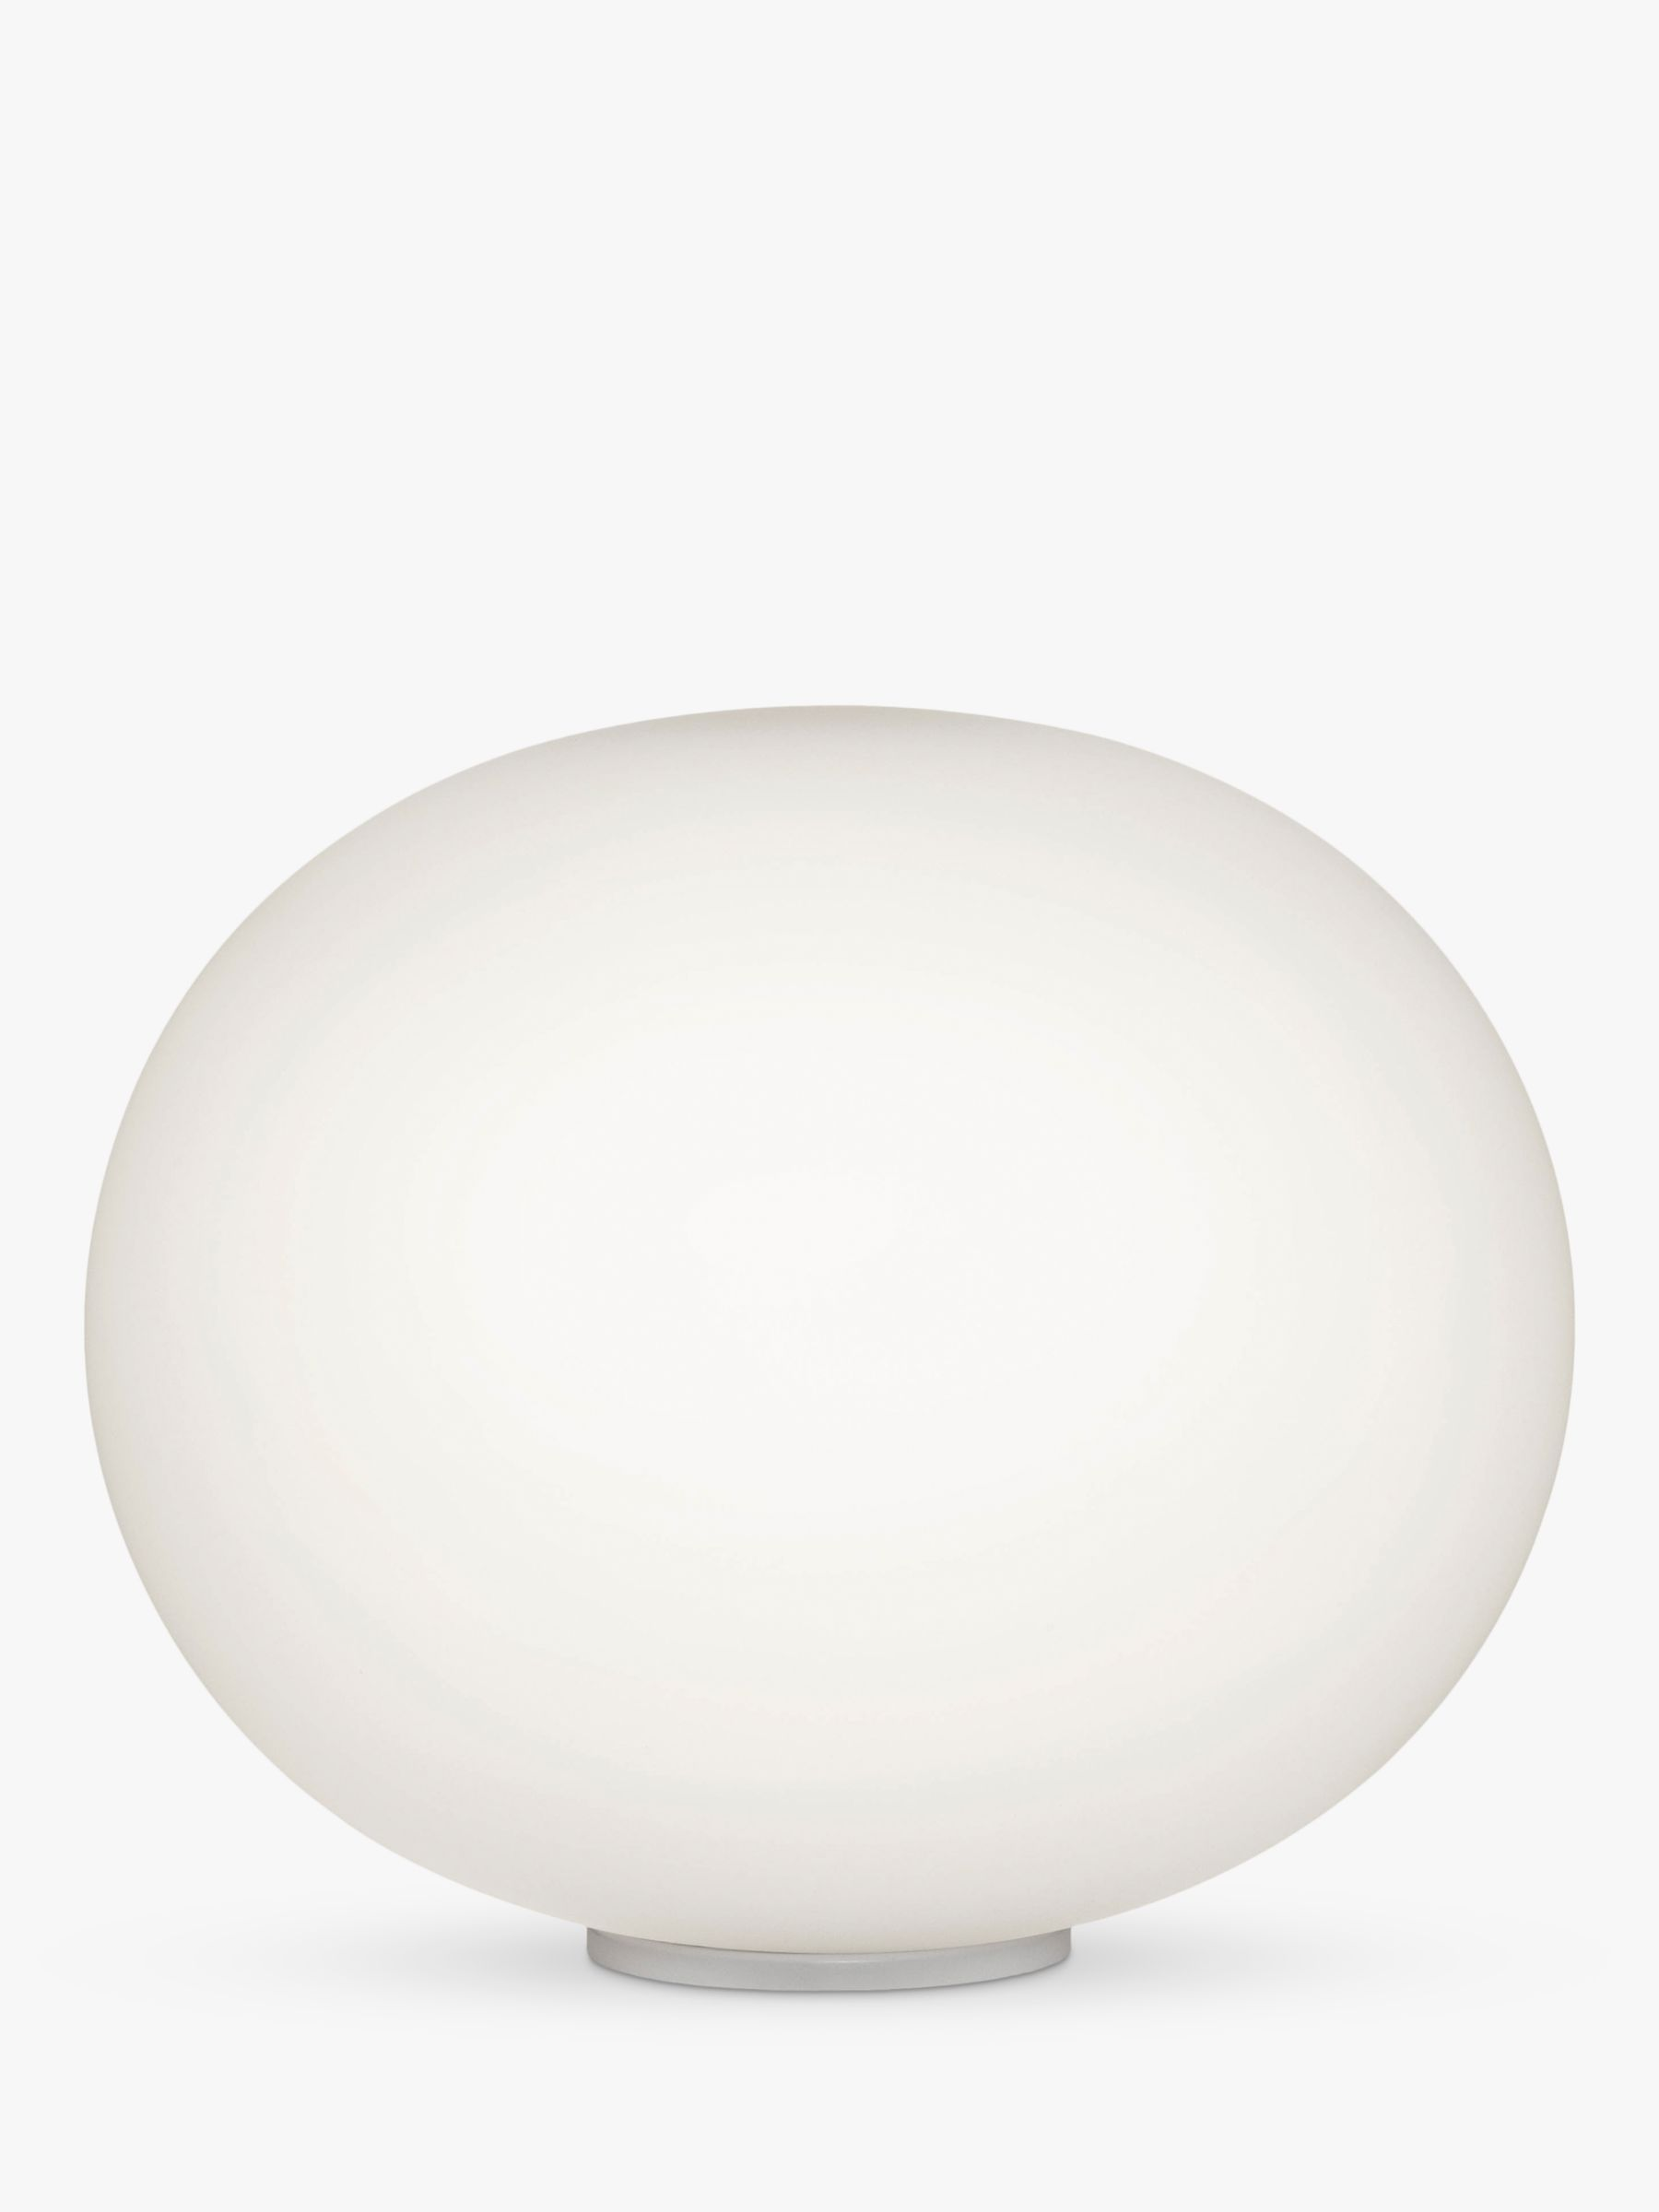 Flos Flos Glo-Ball Basic 1 Table Lamp, White